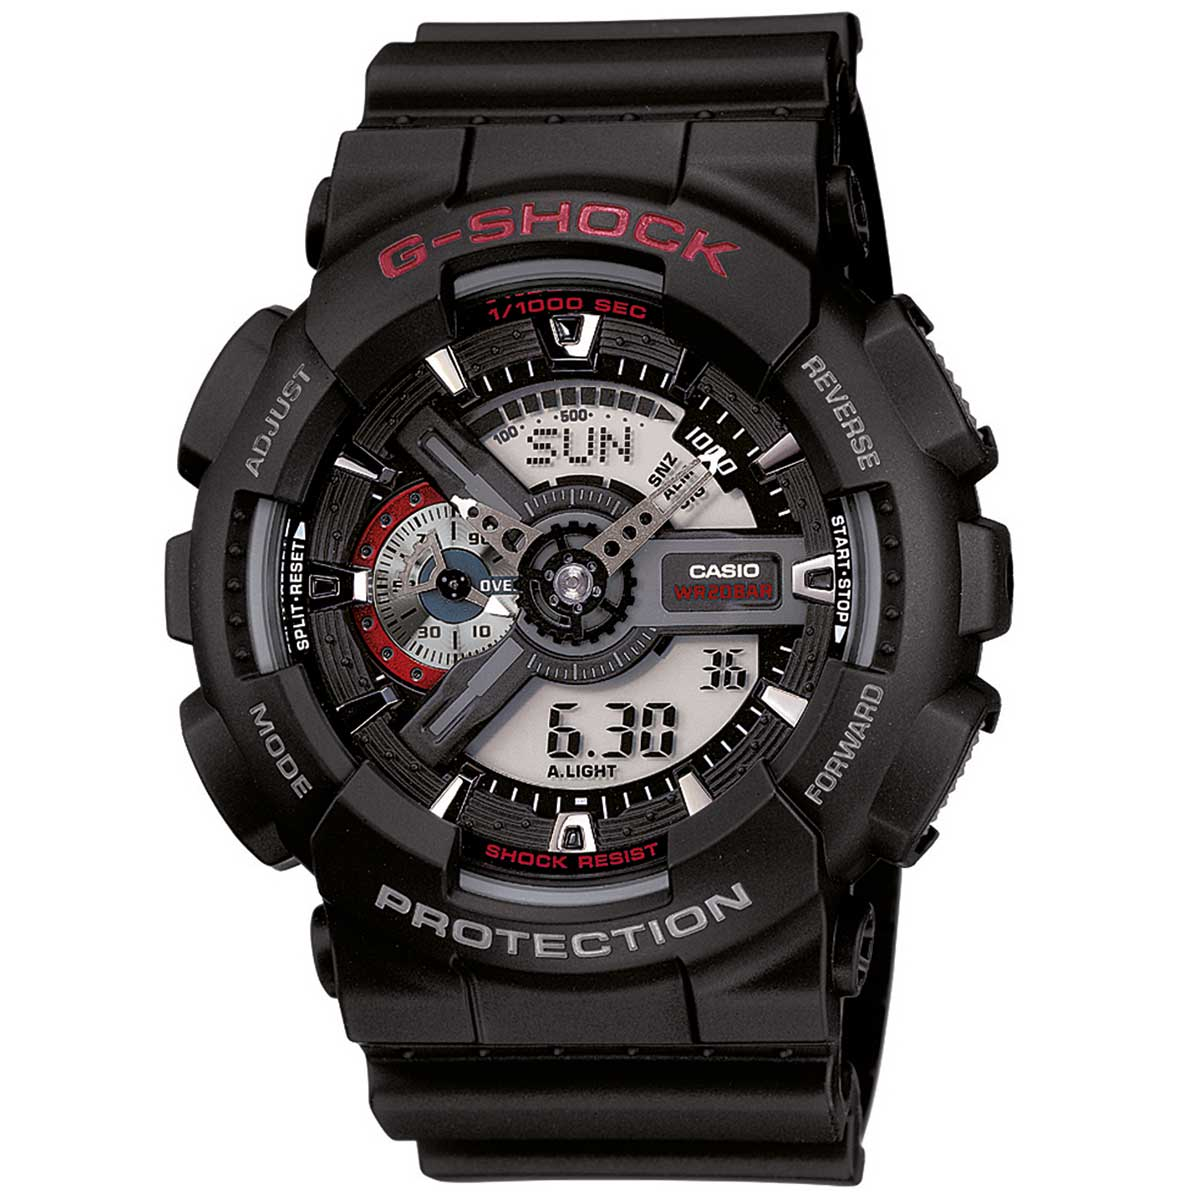 Relógio de Pulso Casio G-ShocK Modelo GA-110-1ADR